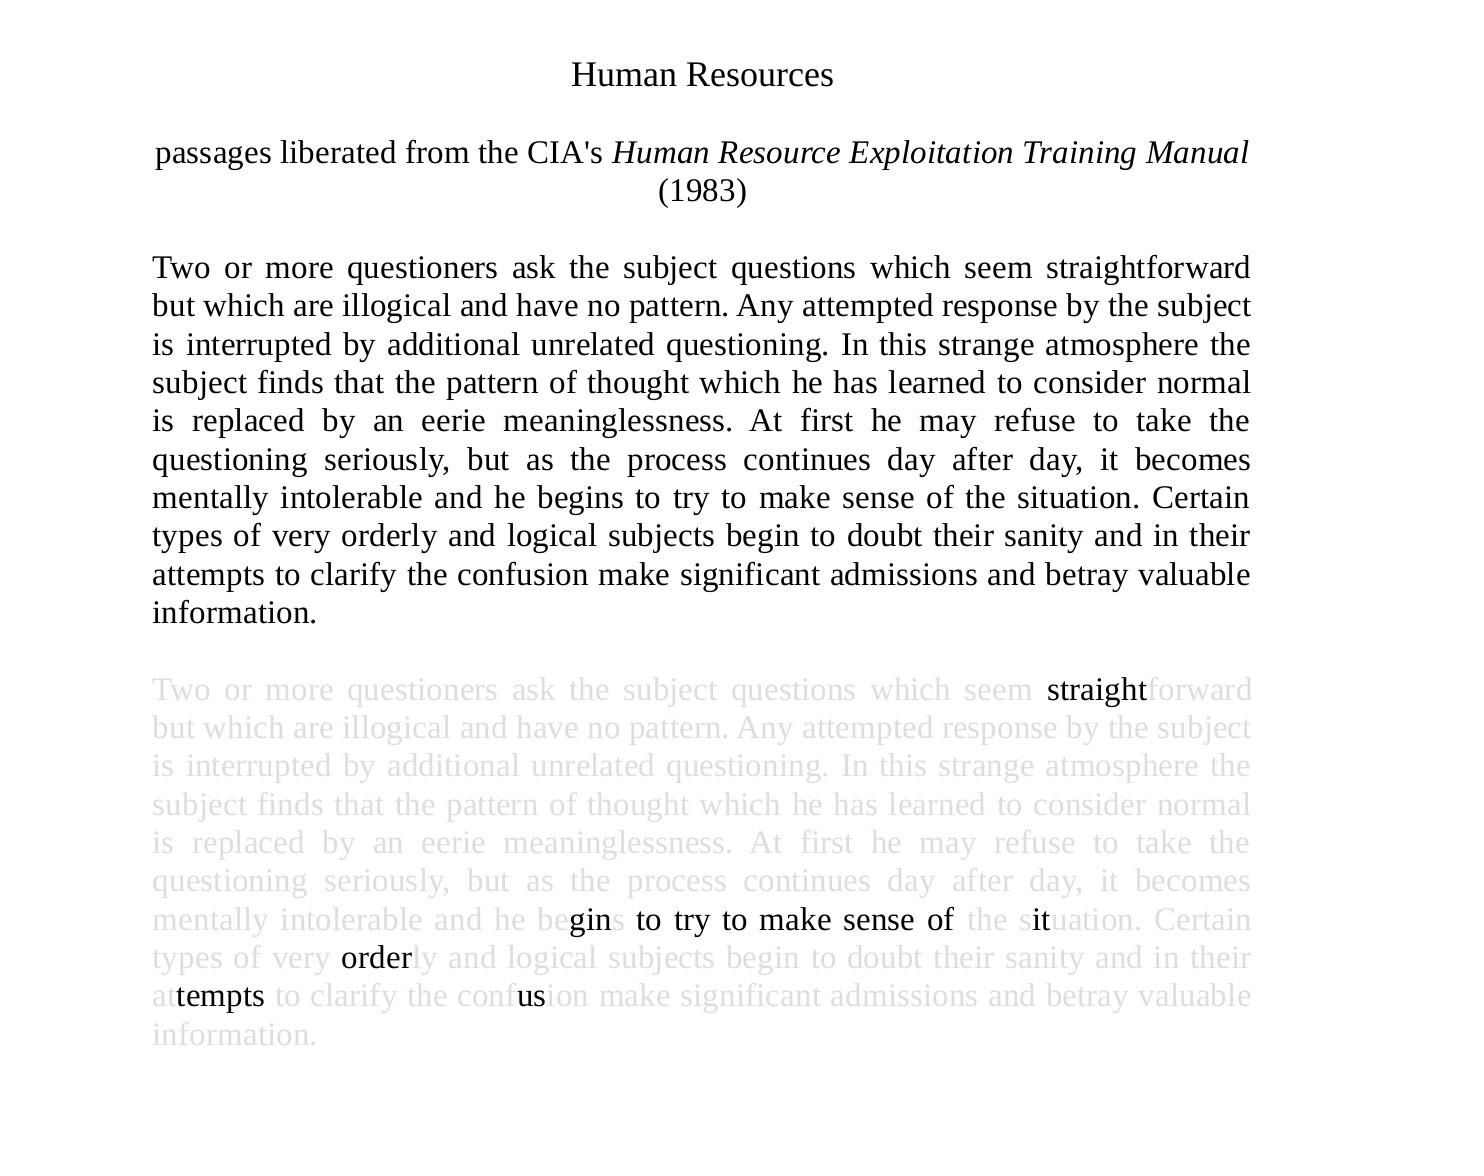 Dave Bonta - Human Resources 14-01-18-1